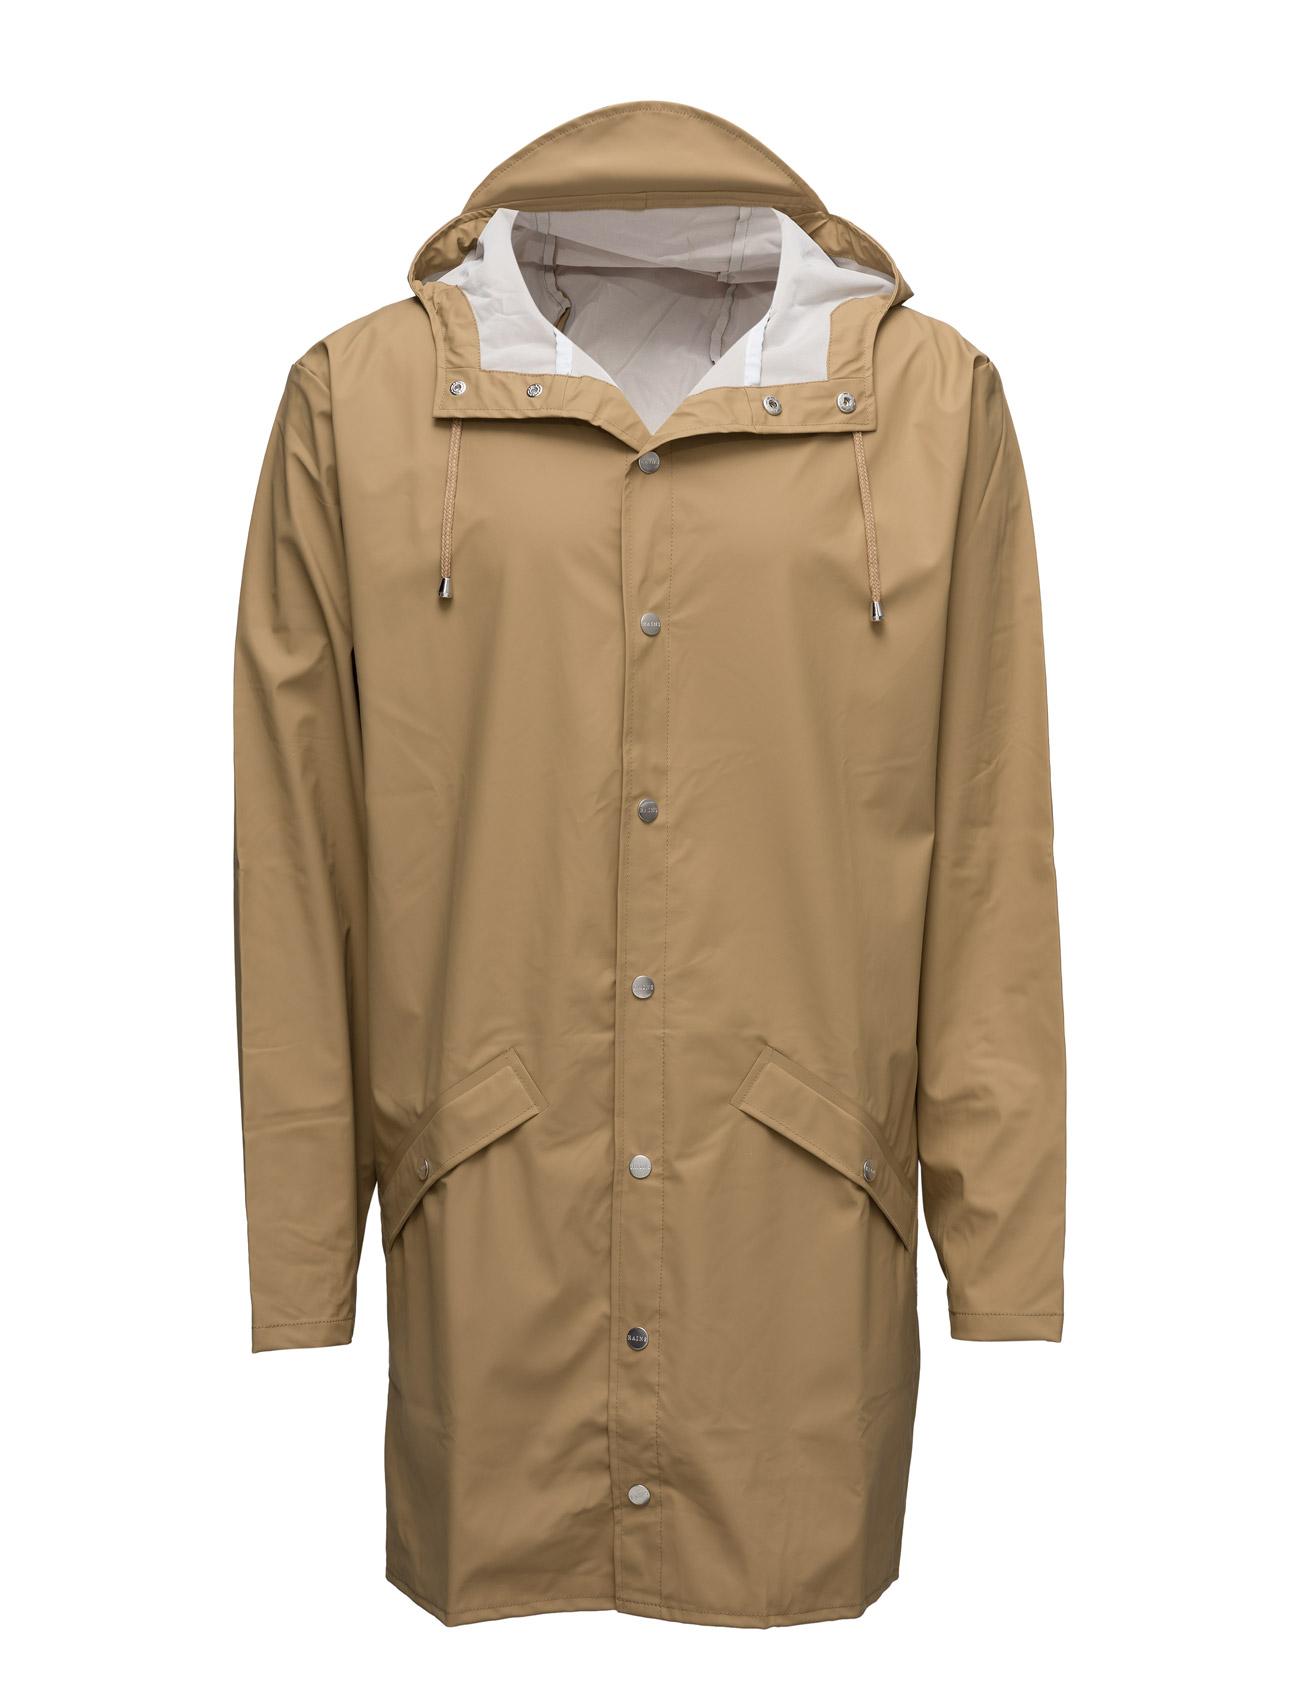 Long Jacket Rains Regntøj til Herrer i 17 Wax Gul